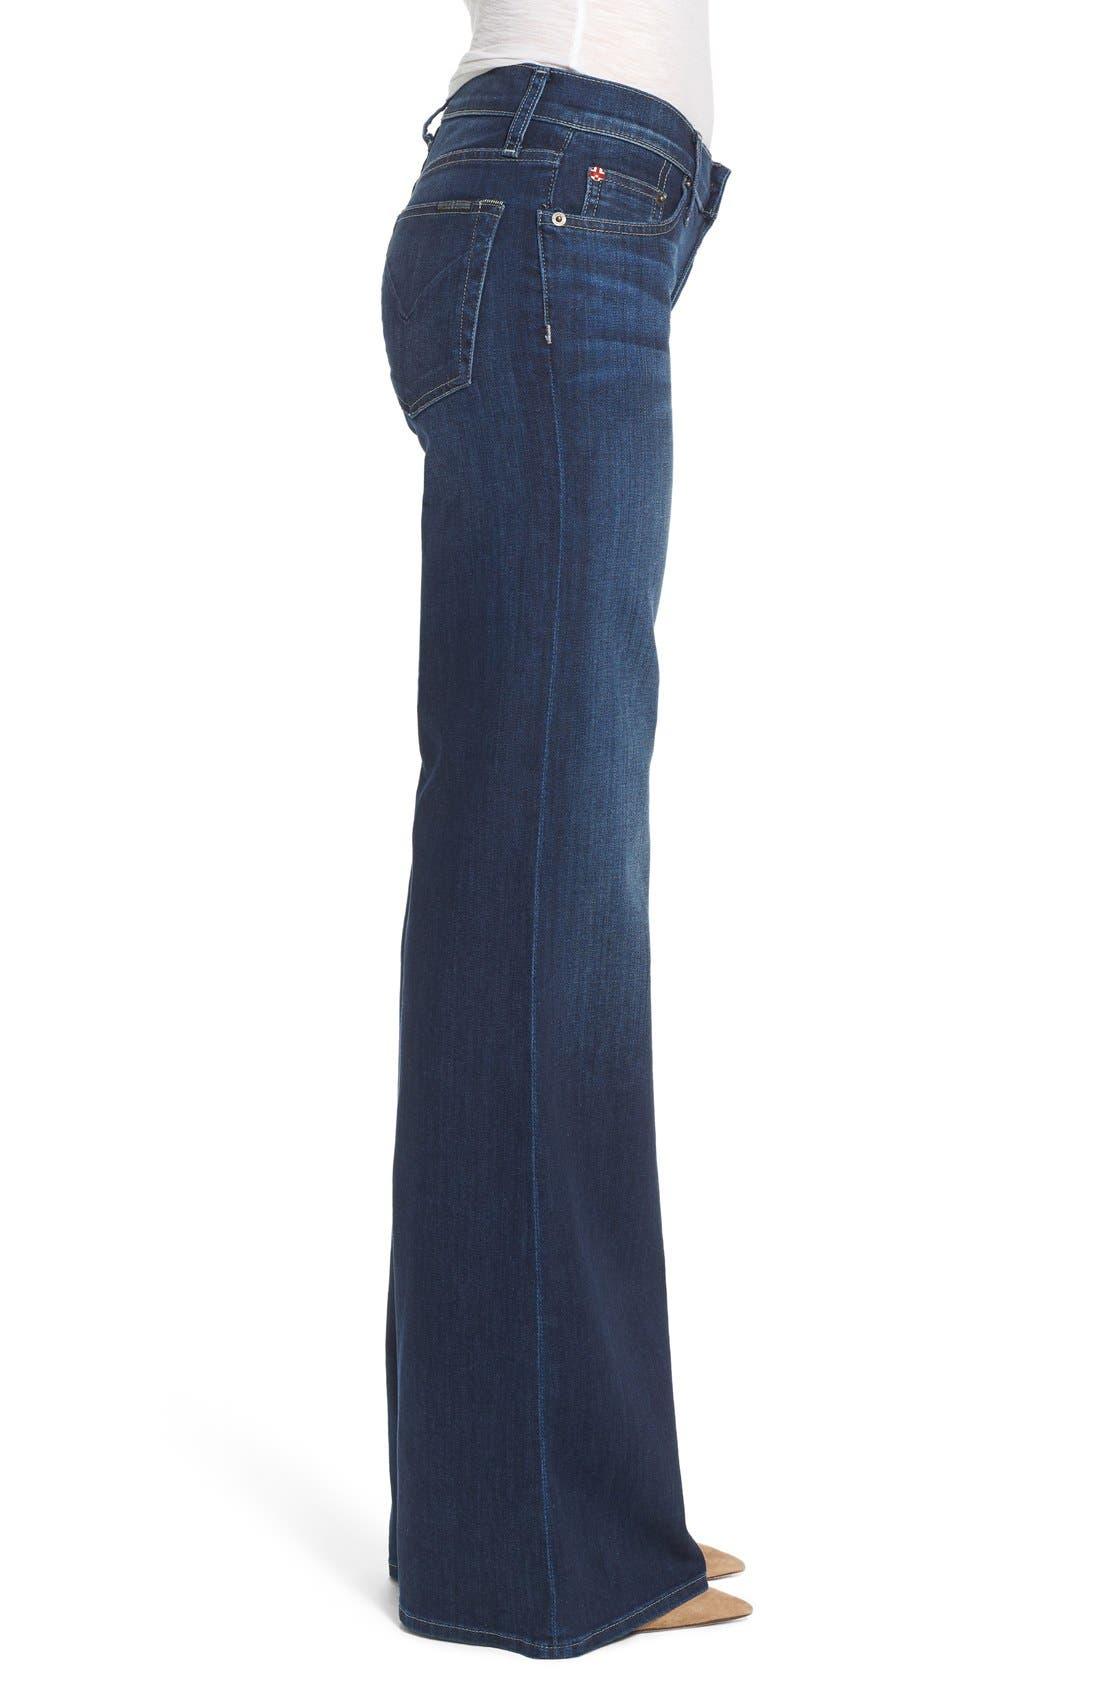 Alternate Image 3  - Hudson Jeans Piper Wide Leg Jeans (Thruway)